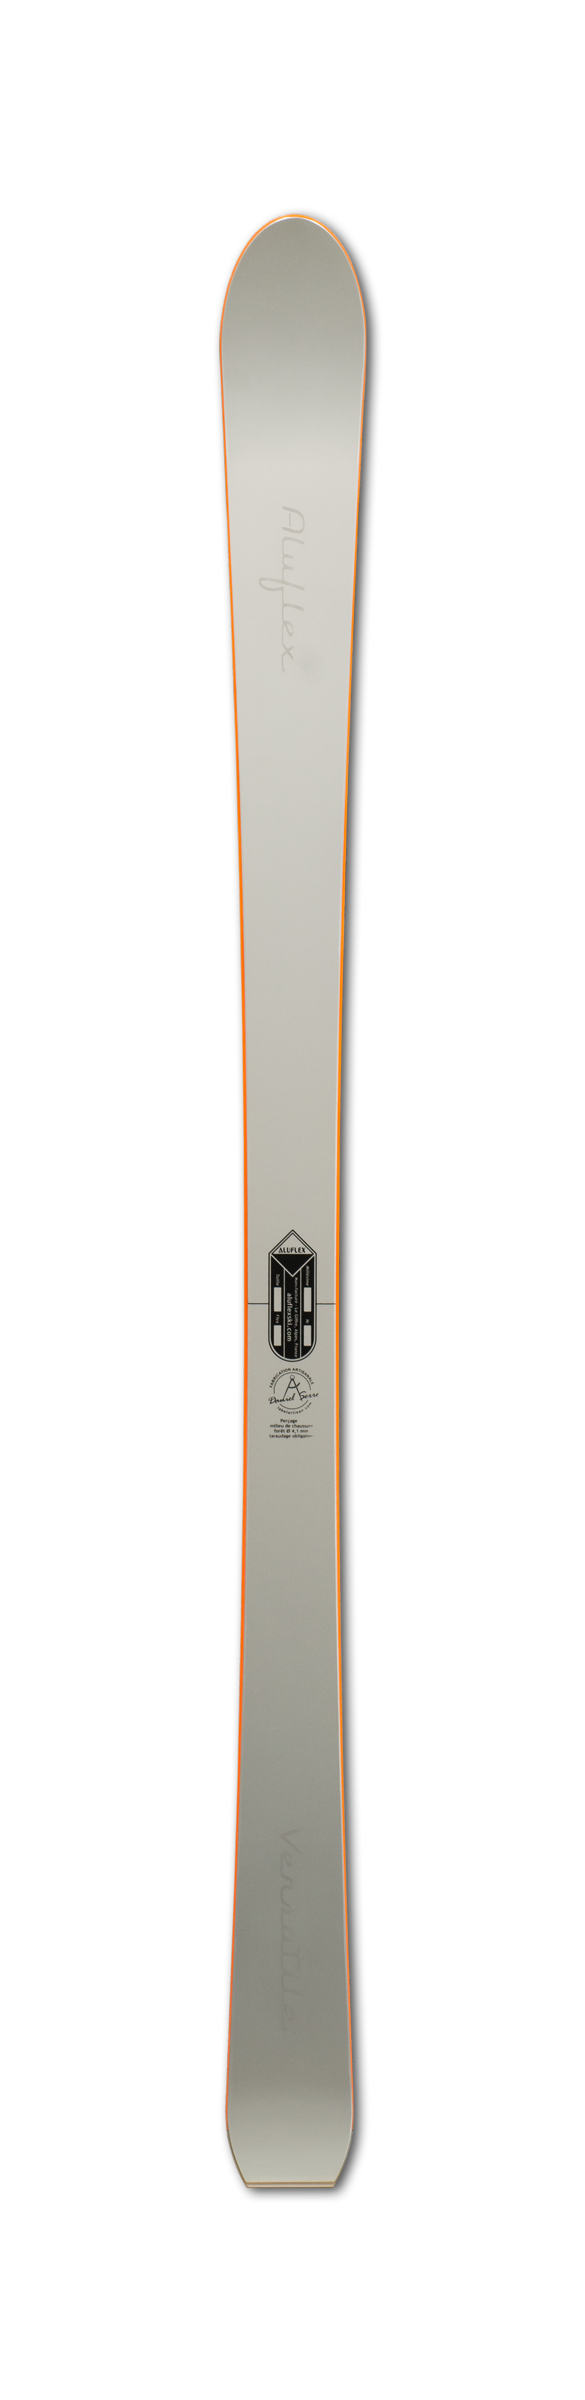 Ski Aluflex Versatile